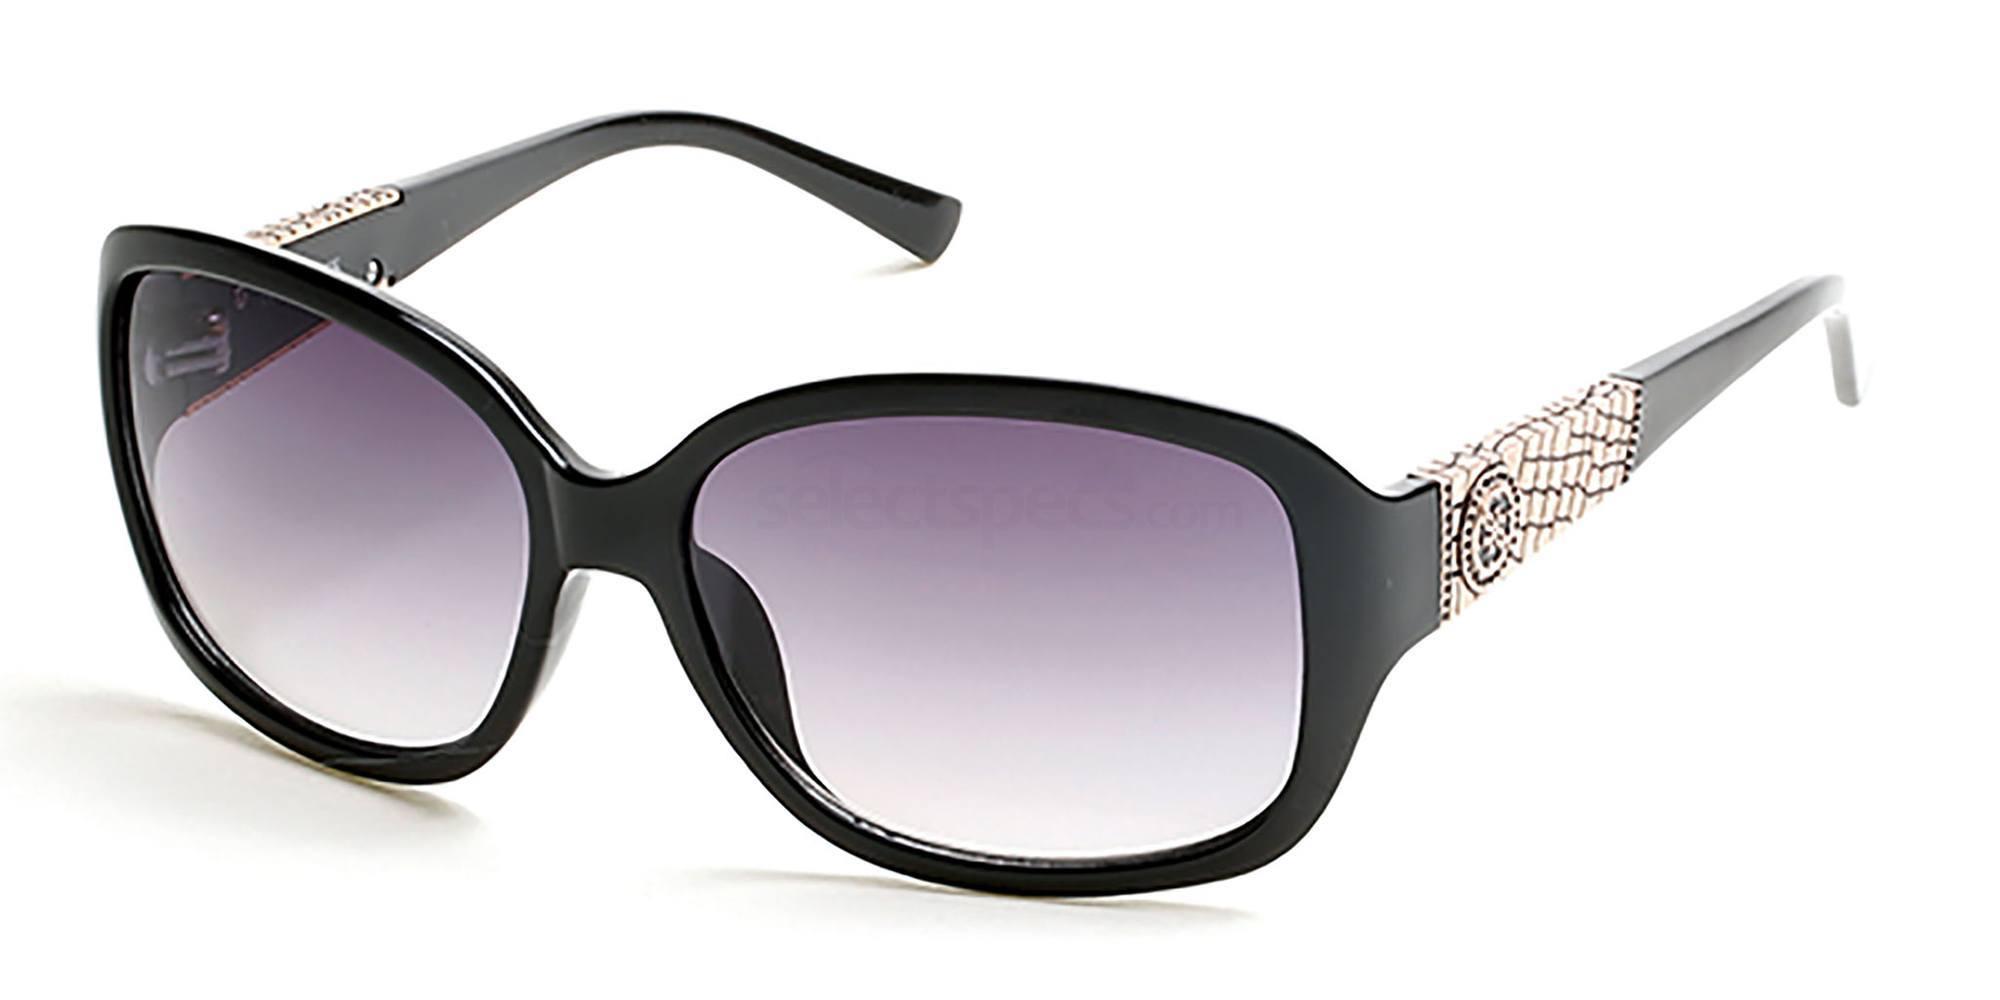 01B GU7418 Sunglasses, Guess